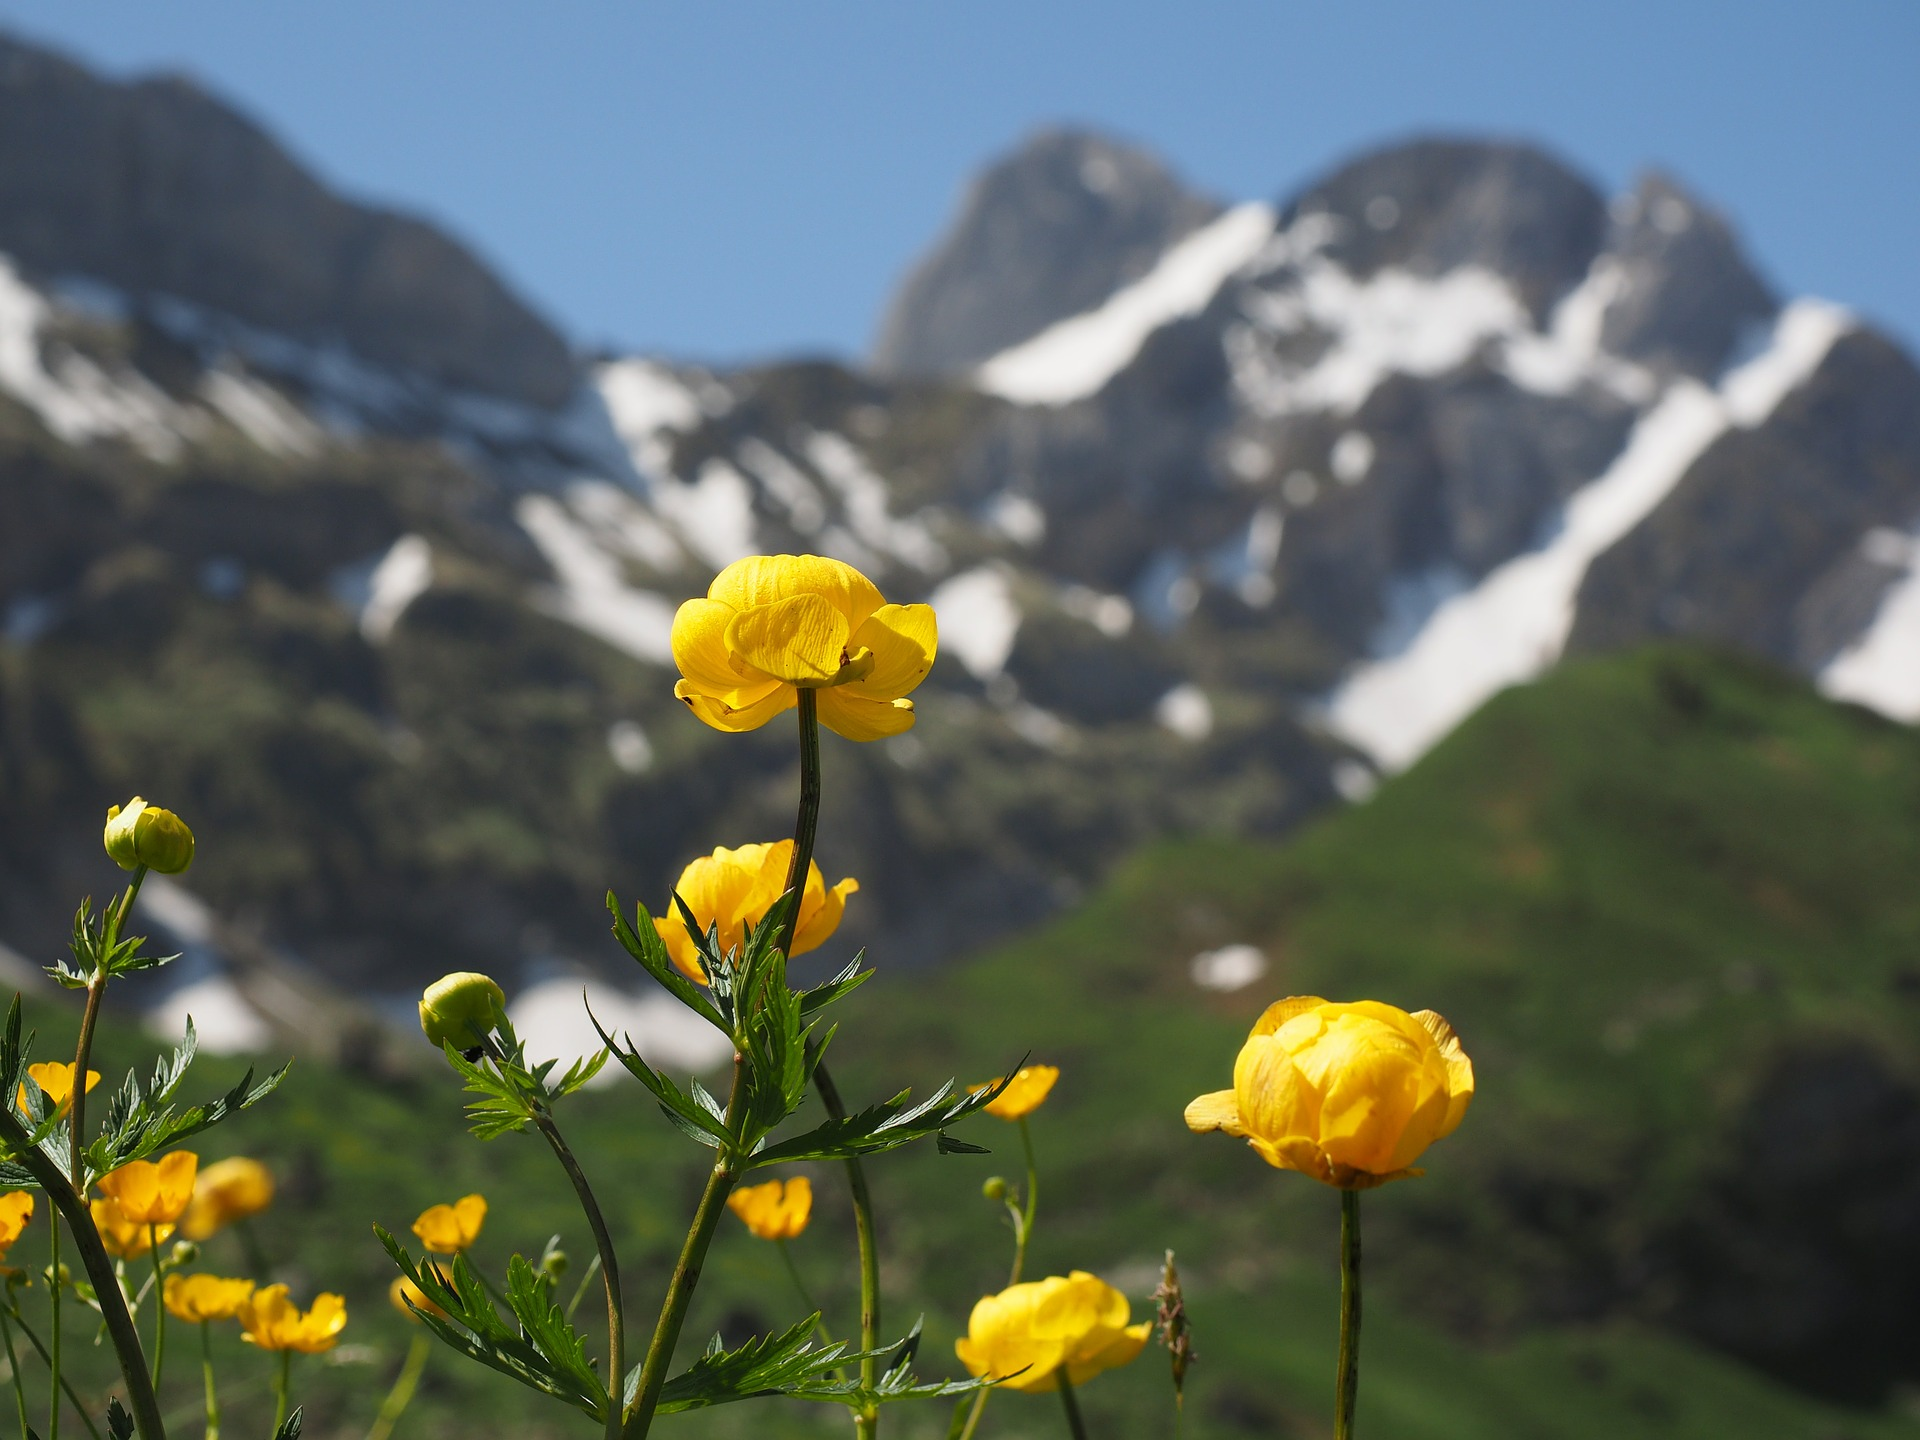 vacanze estive in montagna